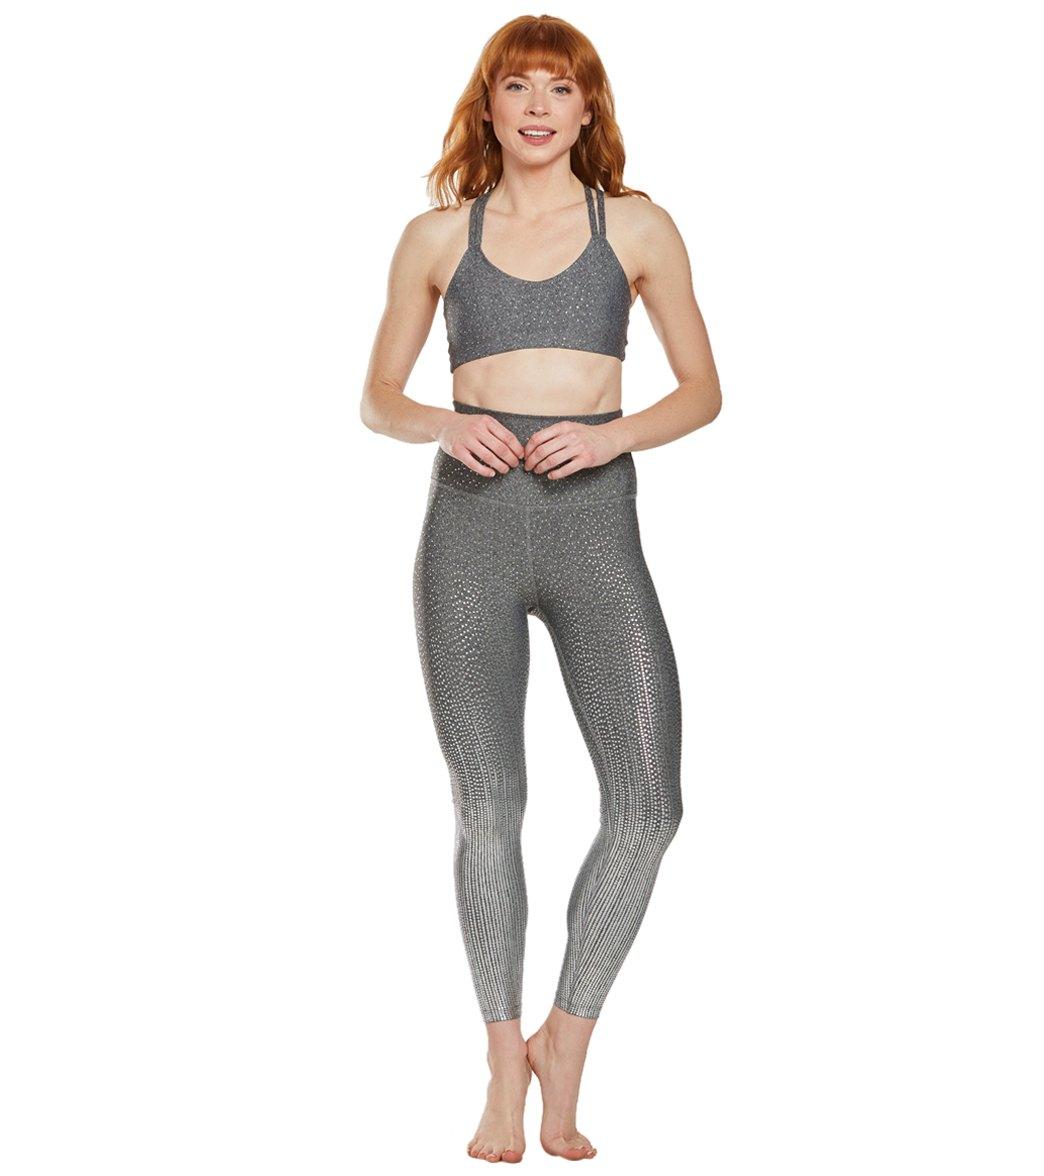 5fc7d6e8906 Beyond Yoga Drip Dot High Waisted 7 8 Yoga Leggings at YogaOutlet ...